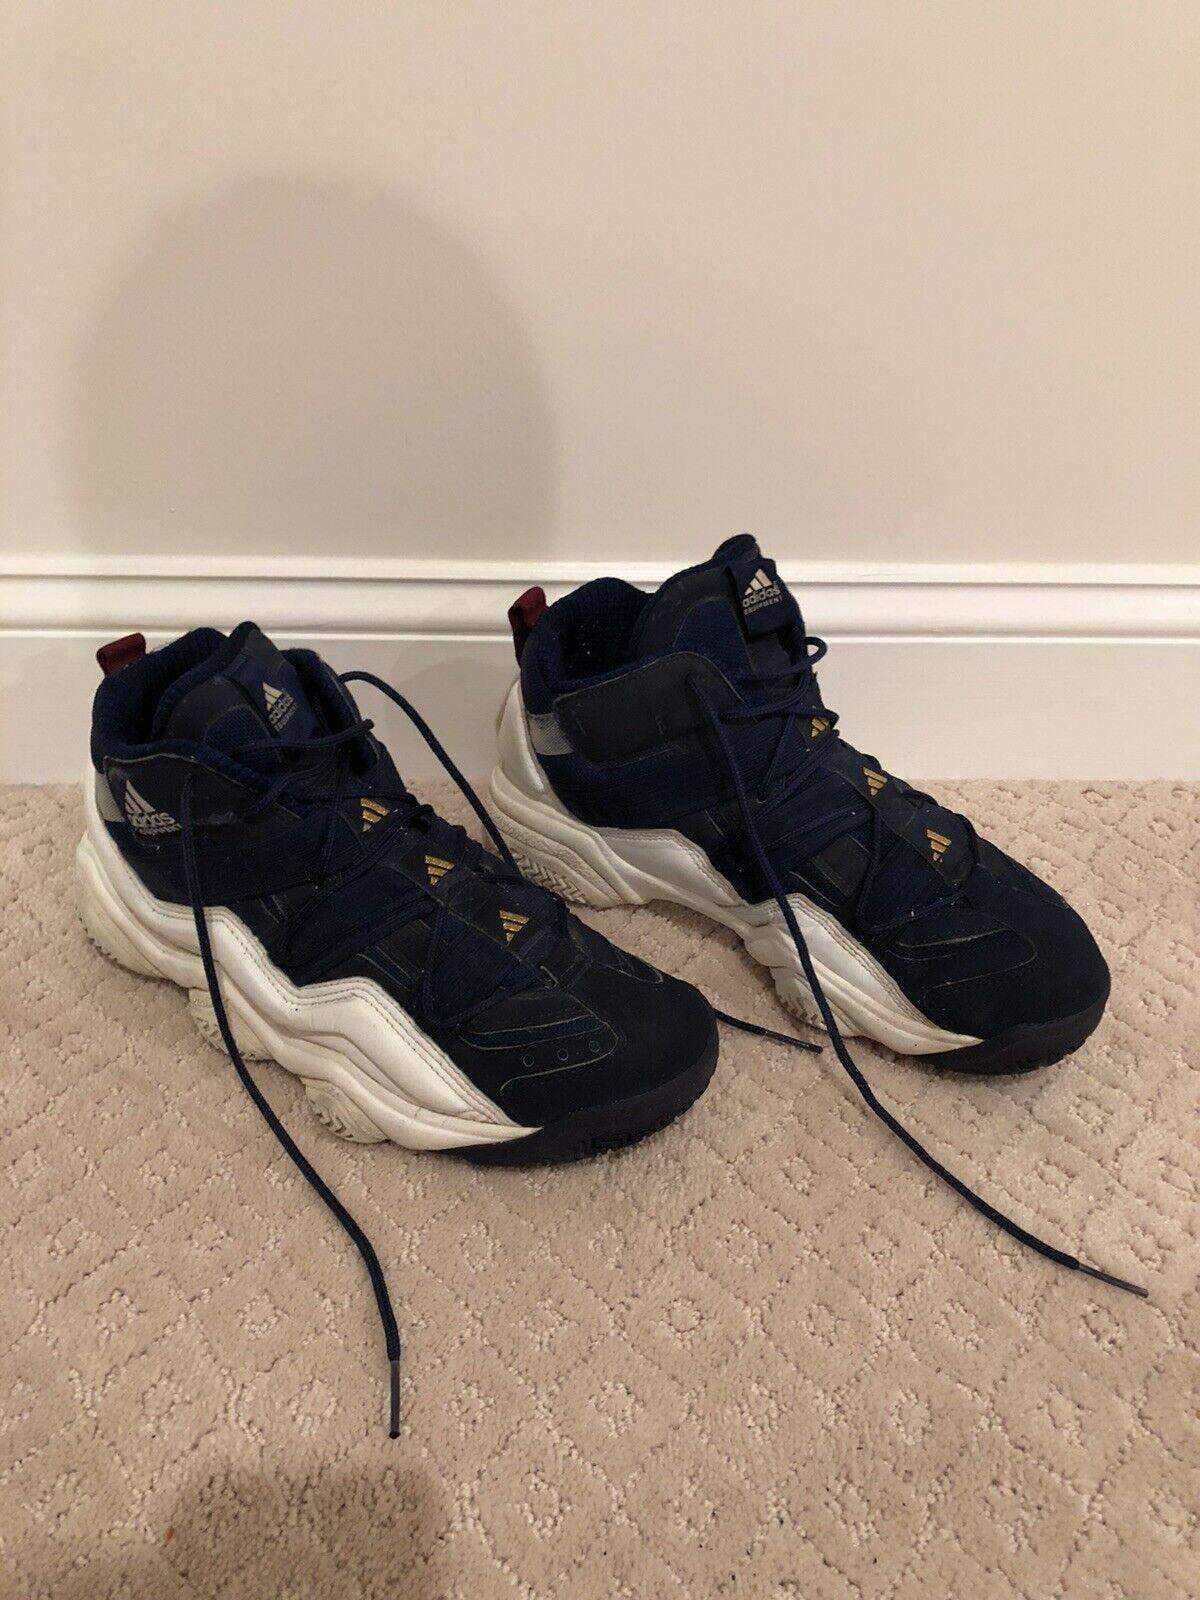 Kobe Bryant Adidas Sneakers. - image 11